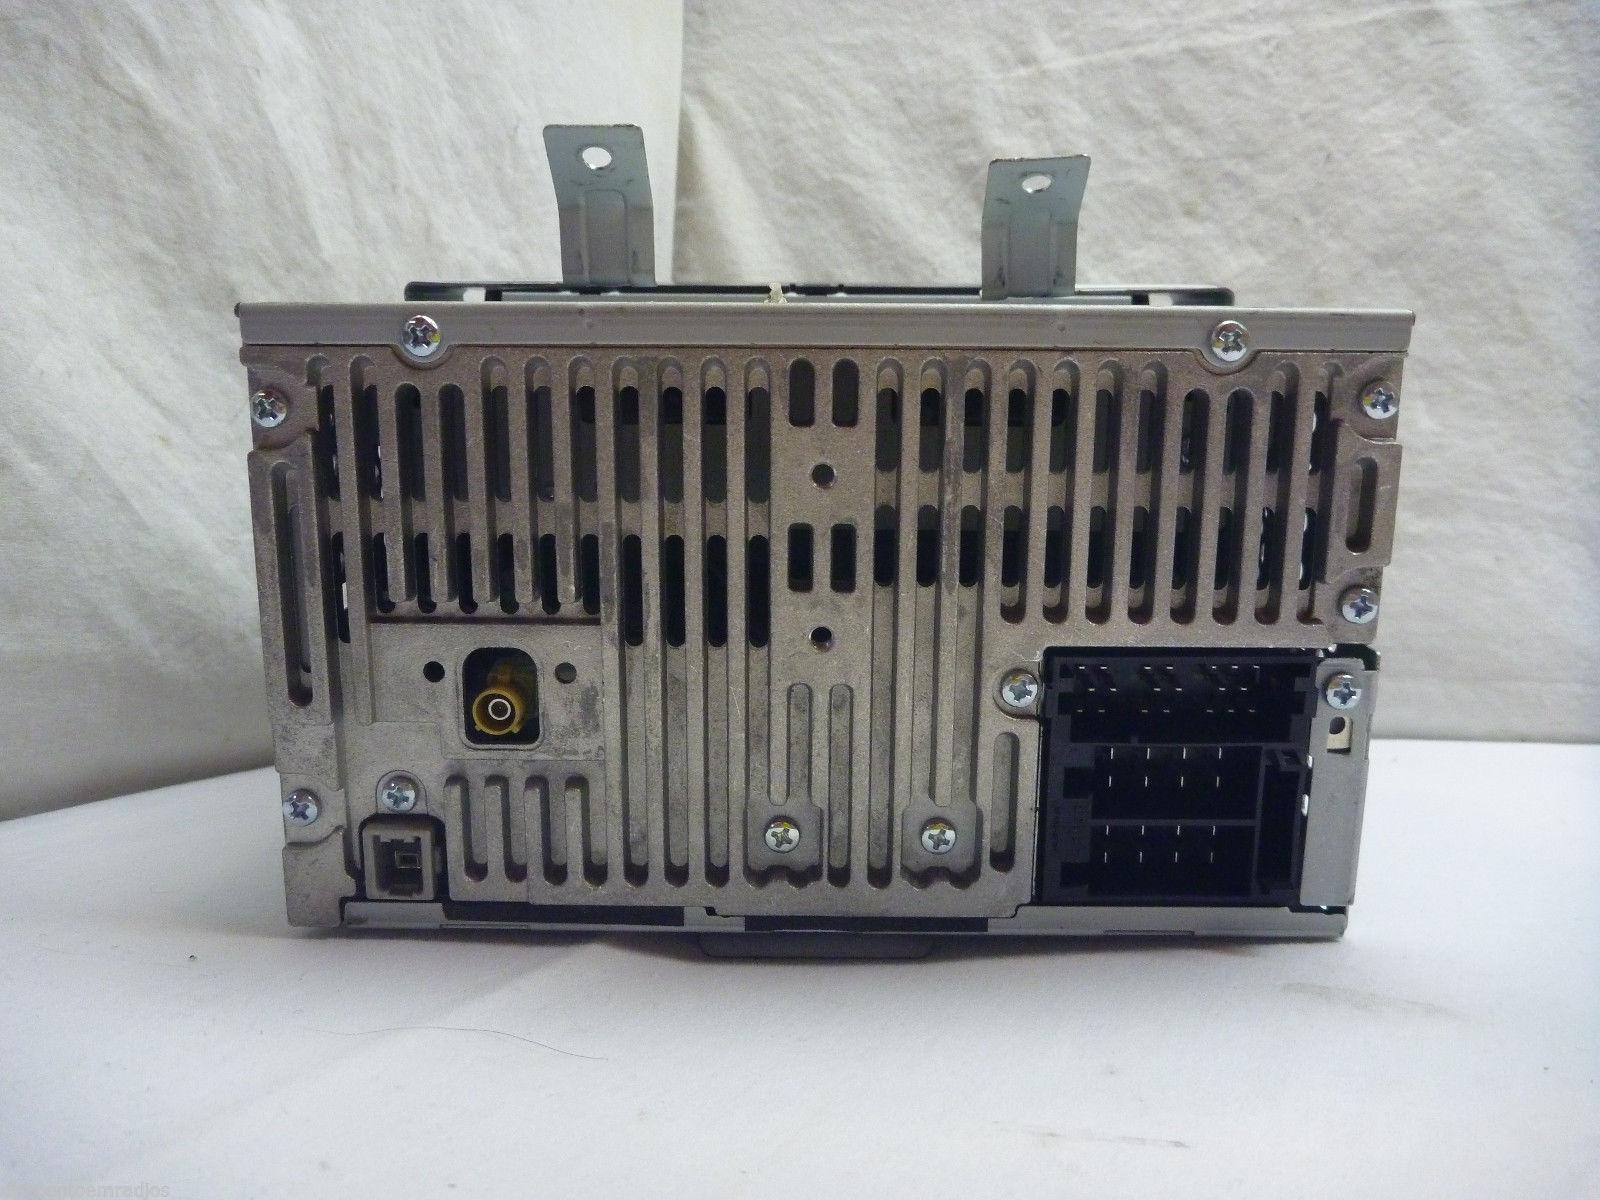 09 10 11 12 Hyundai Genesis Radio Cd Player 96180-2M110AMS4  C54889